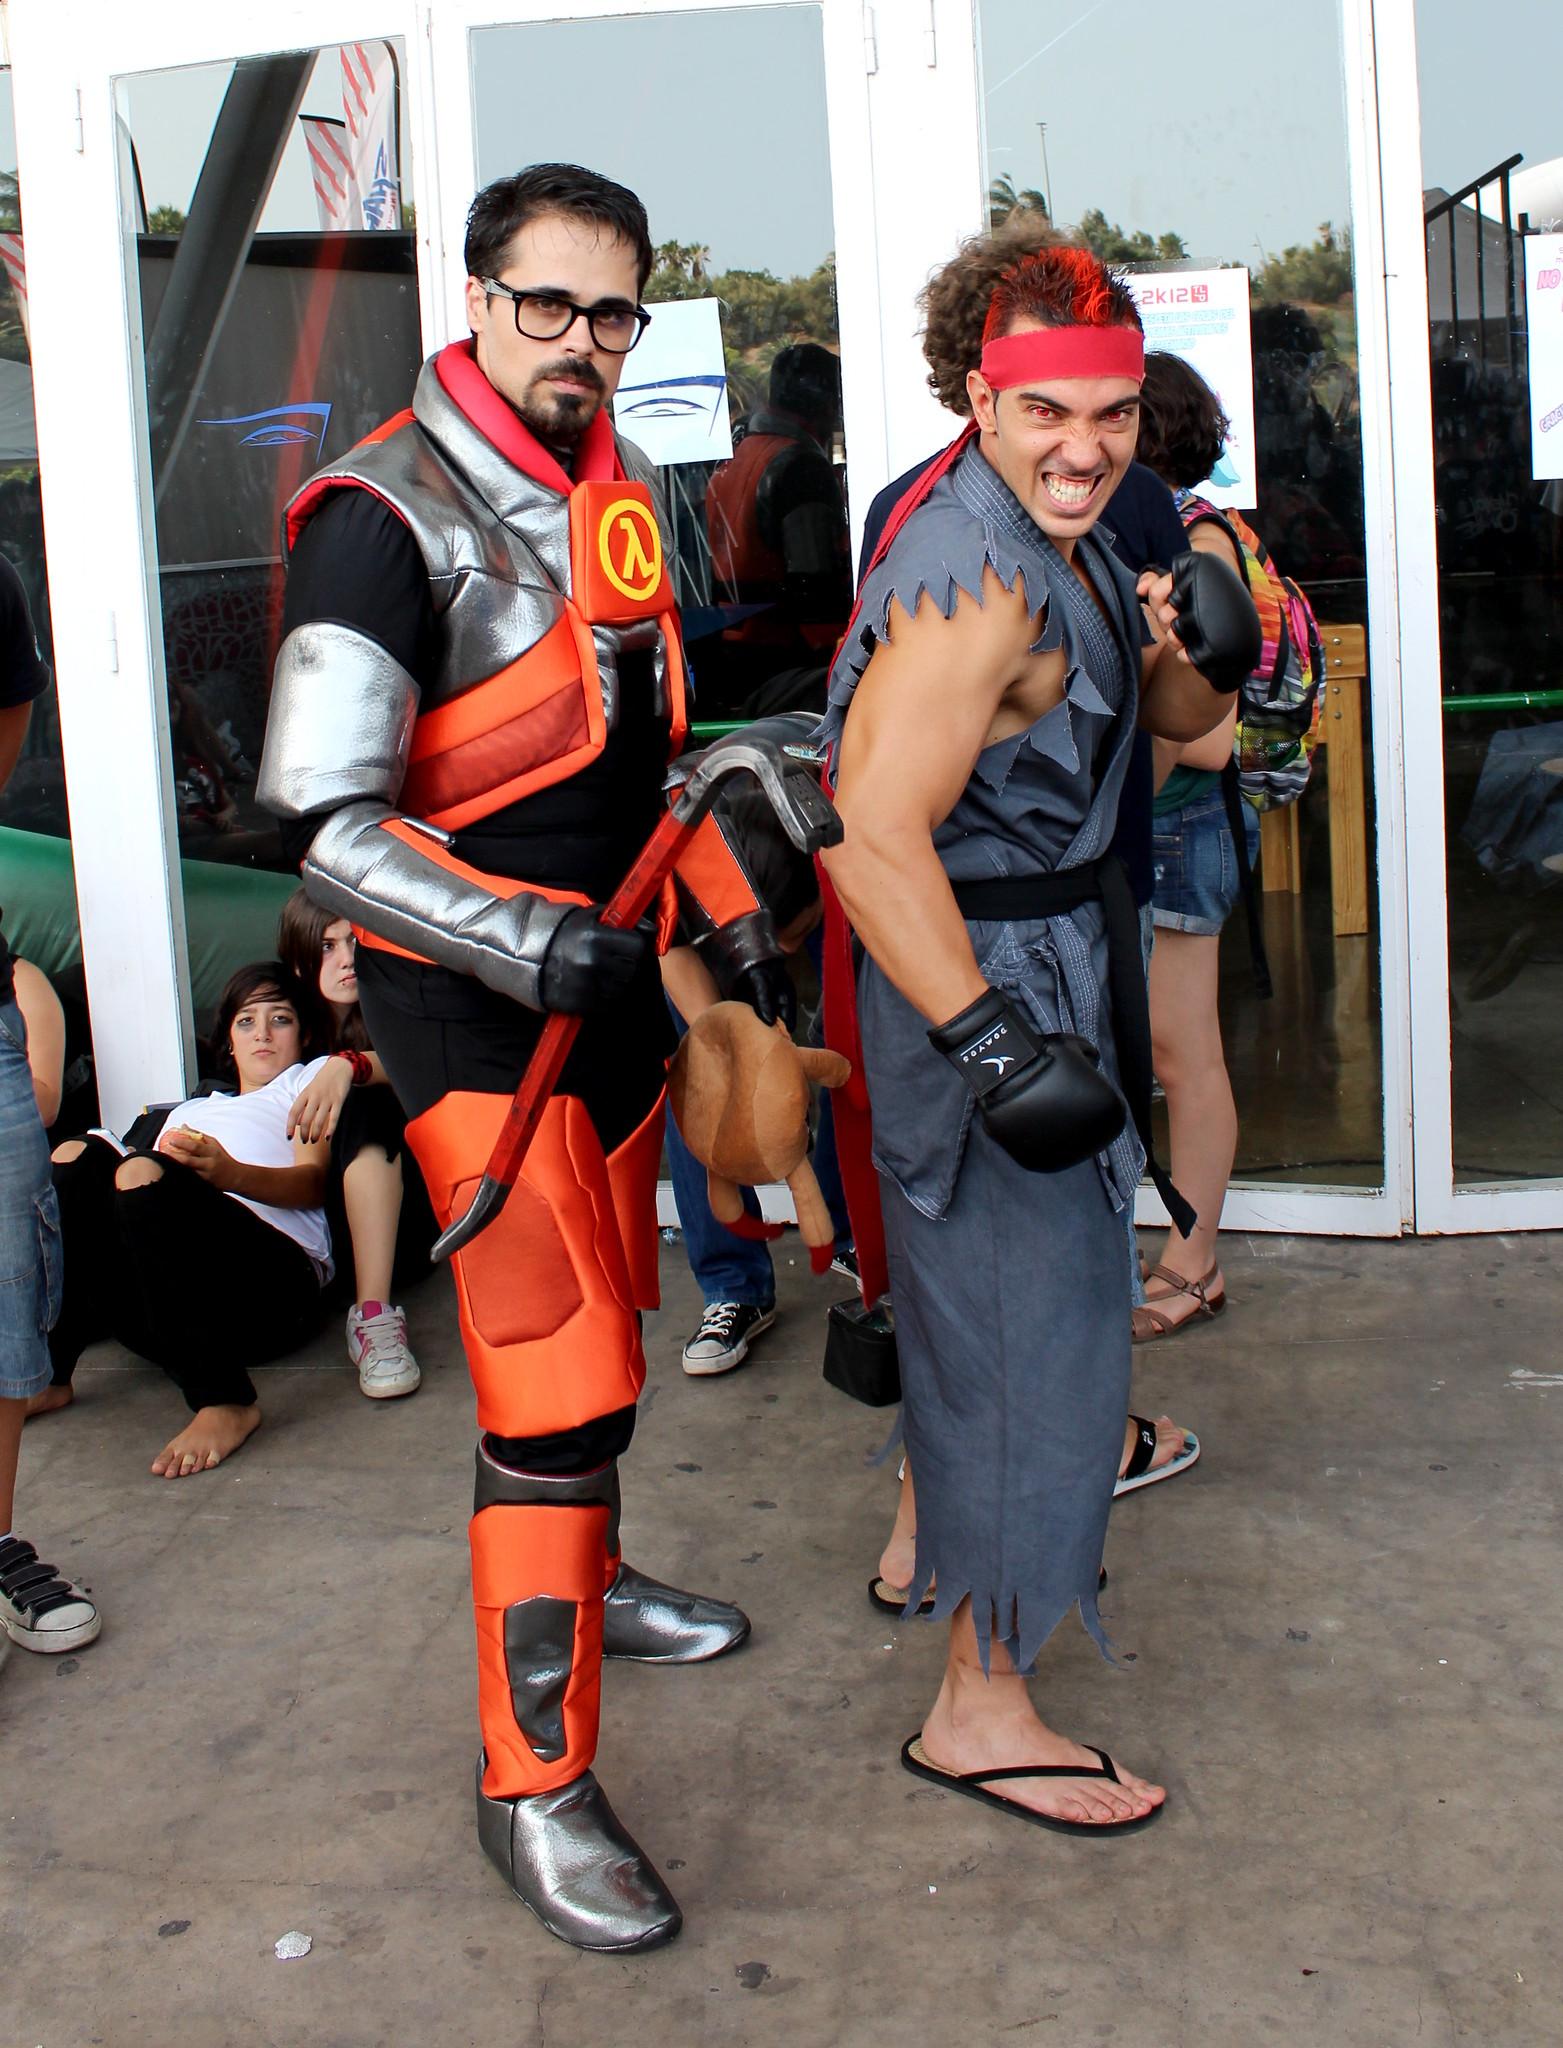 Nico Robin Strong World Cosplay Julio 06i Flickr